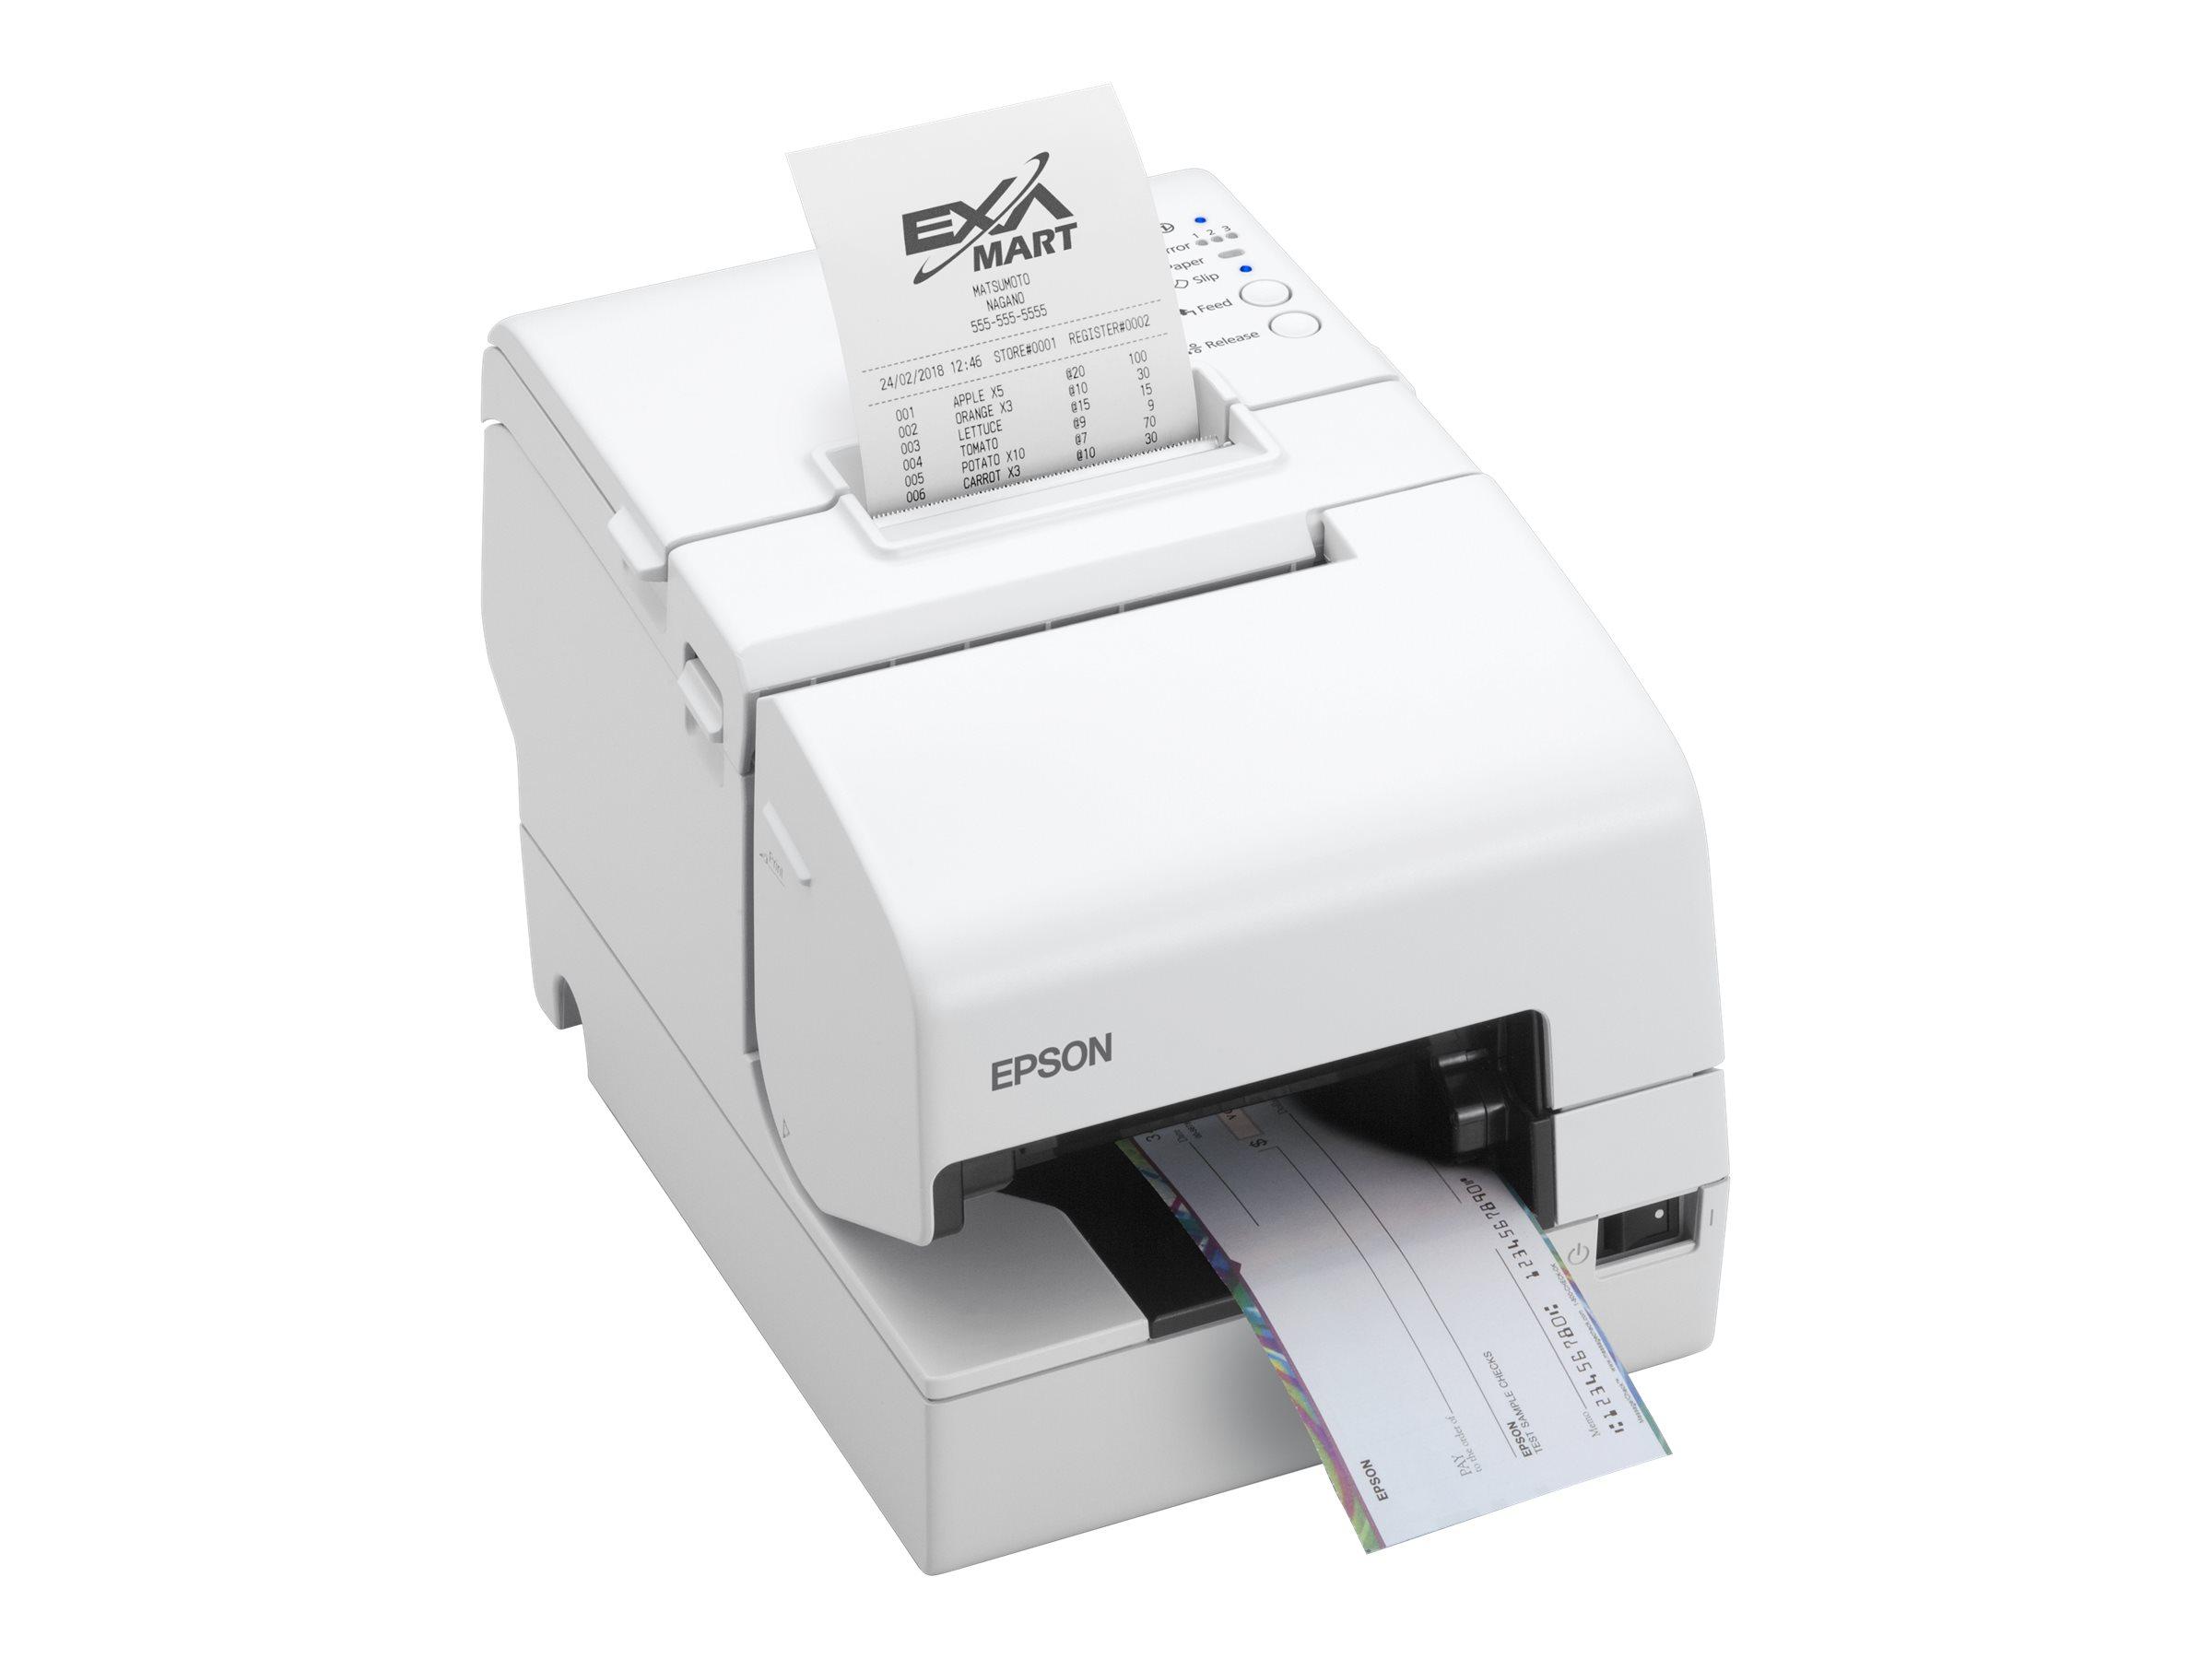 Epson TM H6000V - Belegdrucker - Thermozeile/Punktmatrix - 230 x 297 mm, Rolle (7,95 cm) - 180 x 180 dpi - 9 Pin